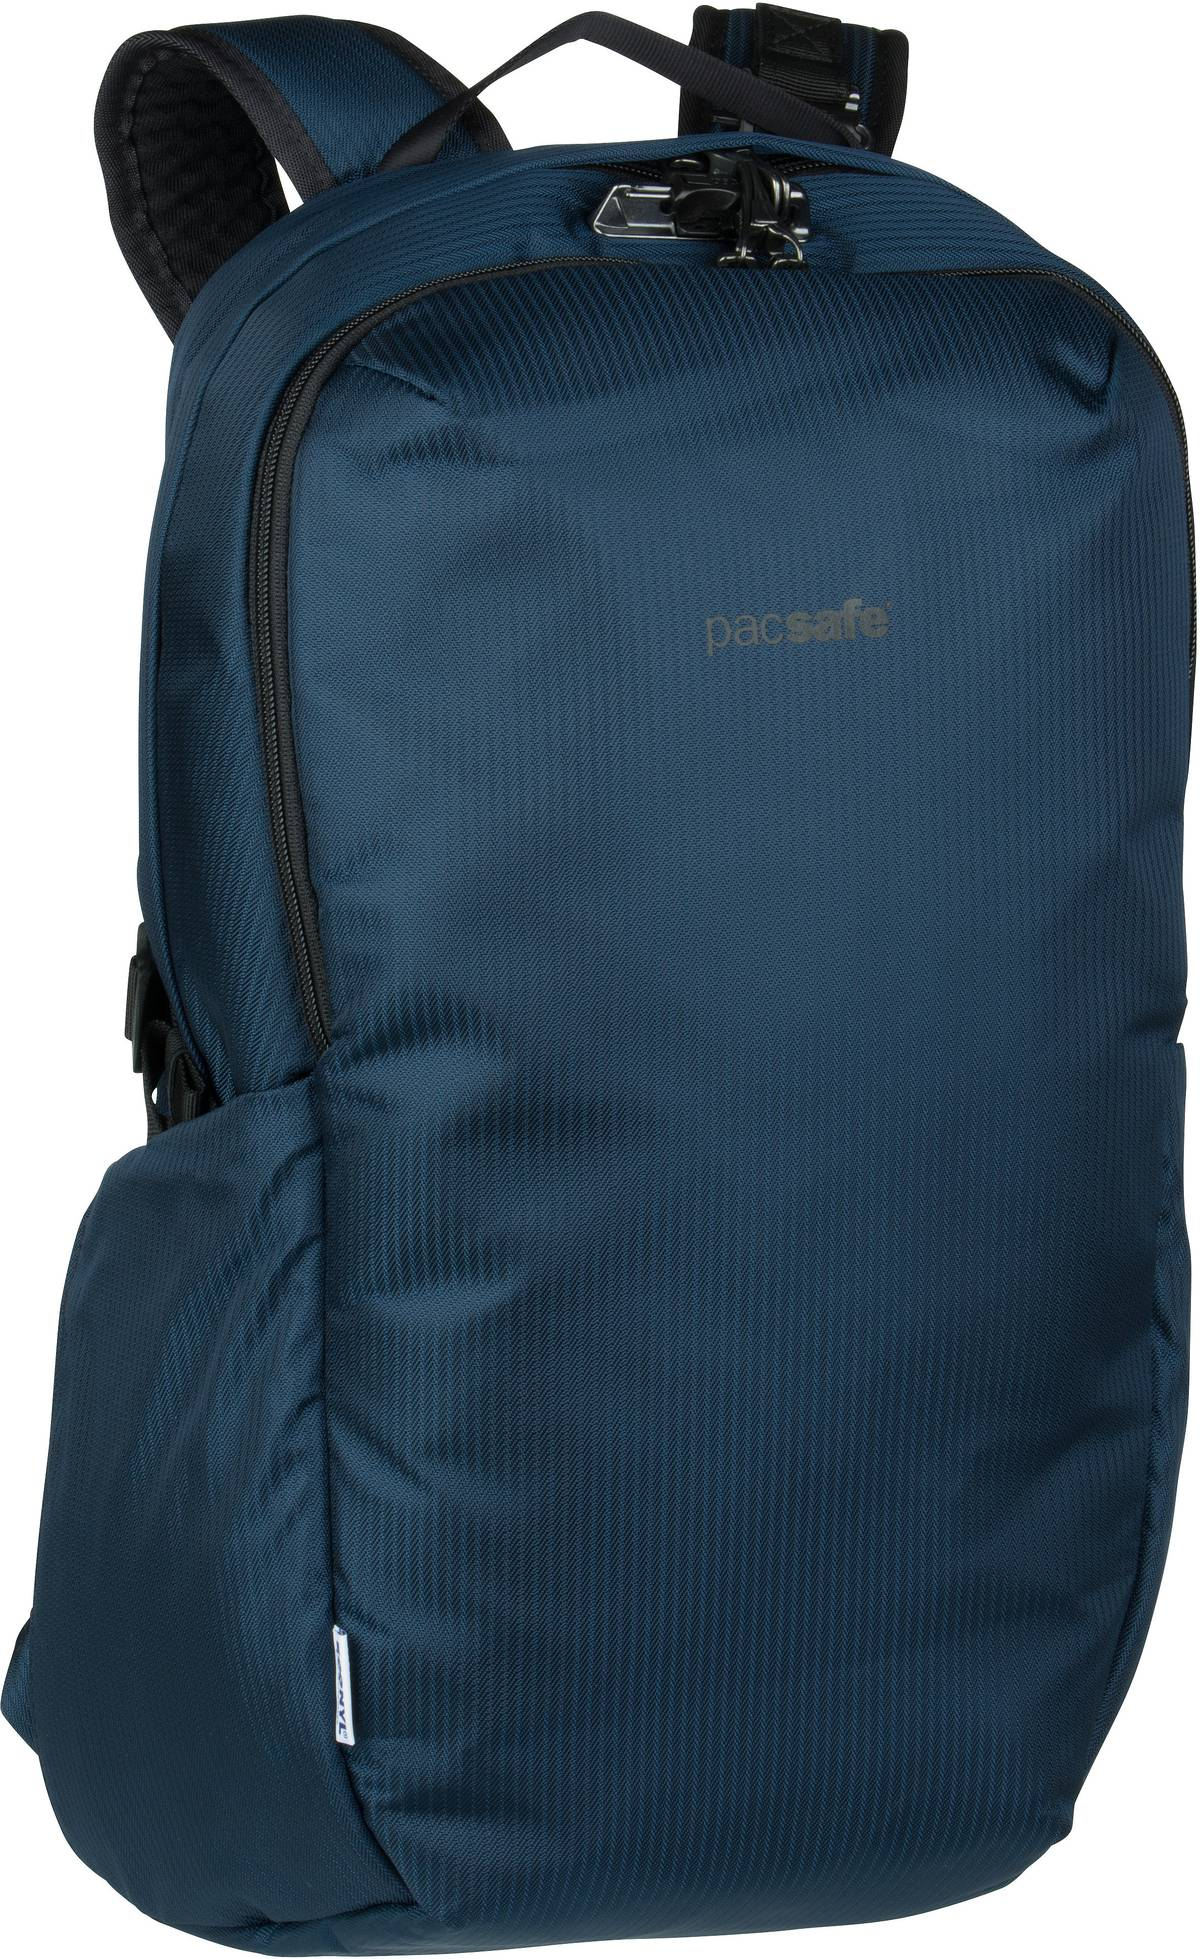 Rucksack / Daypack Vibe 25L ECONYL ECONYL Ocean (25 Liter)